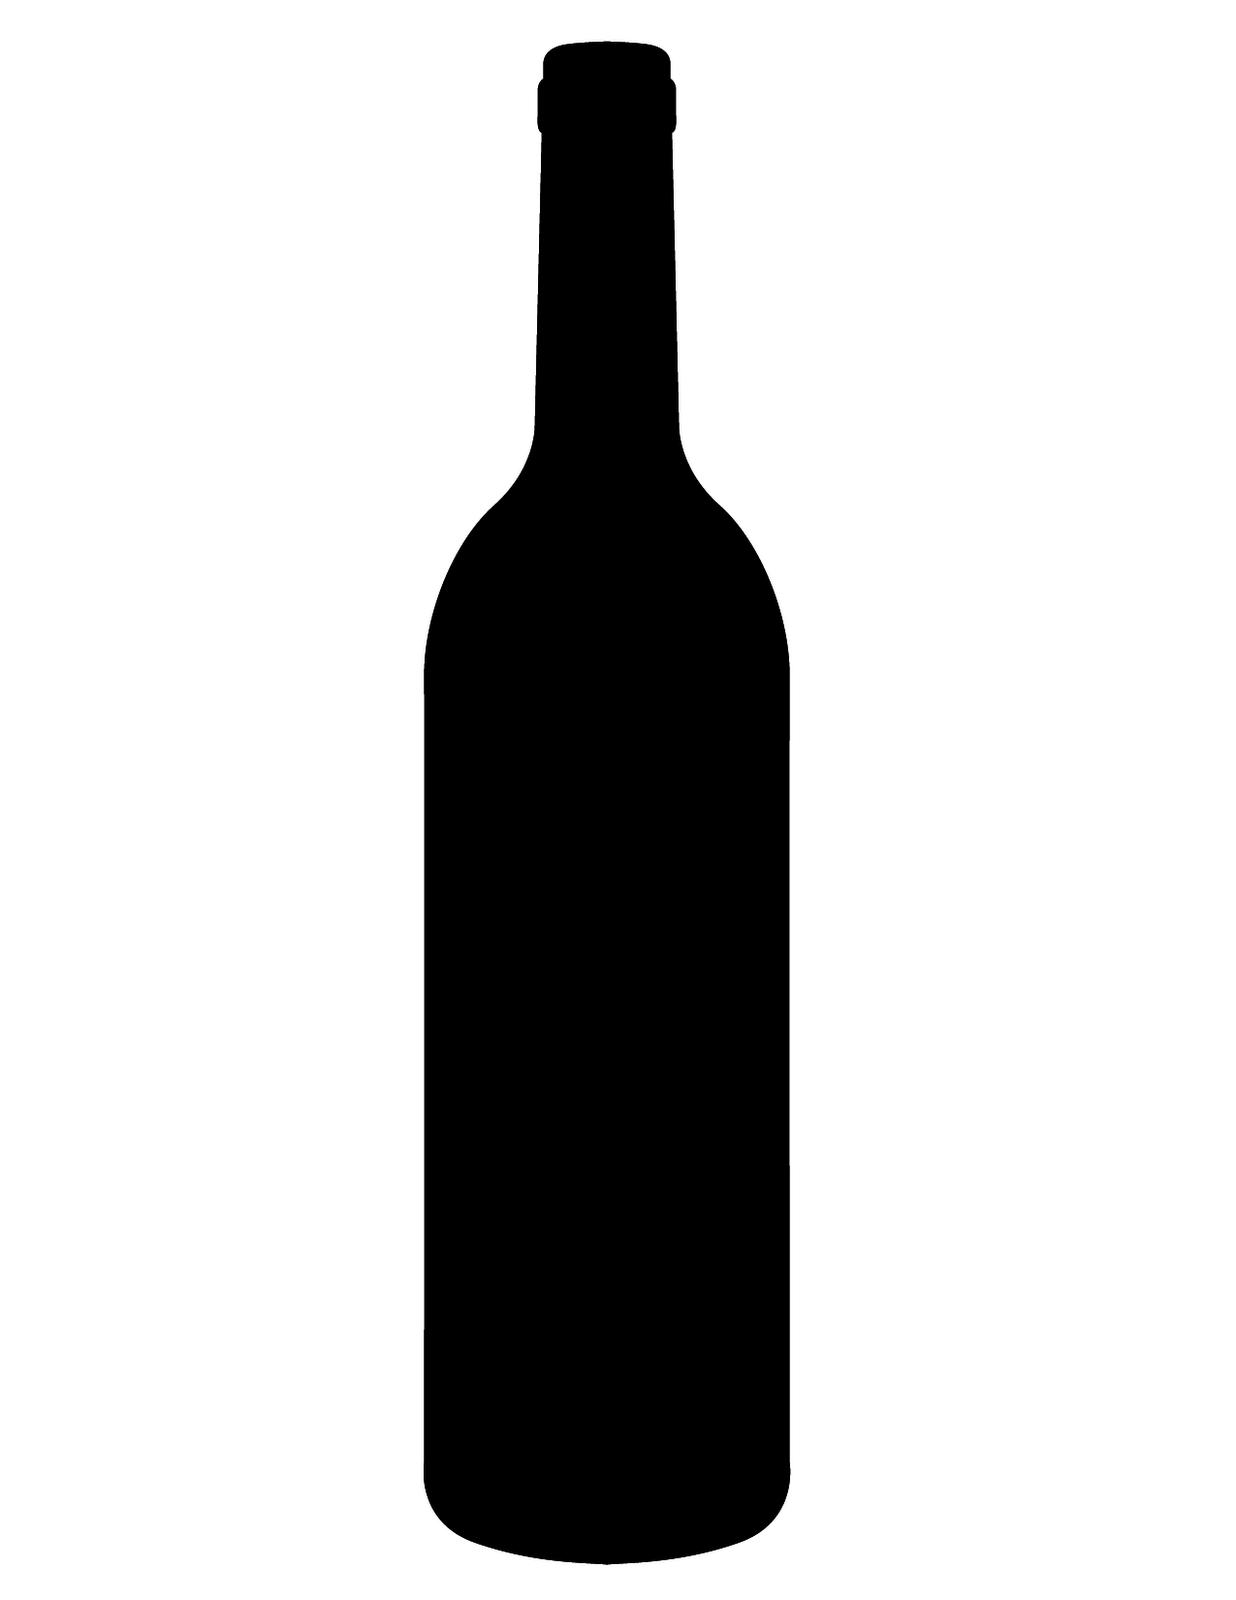 $50 Bottle (Mendham Twp Library)